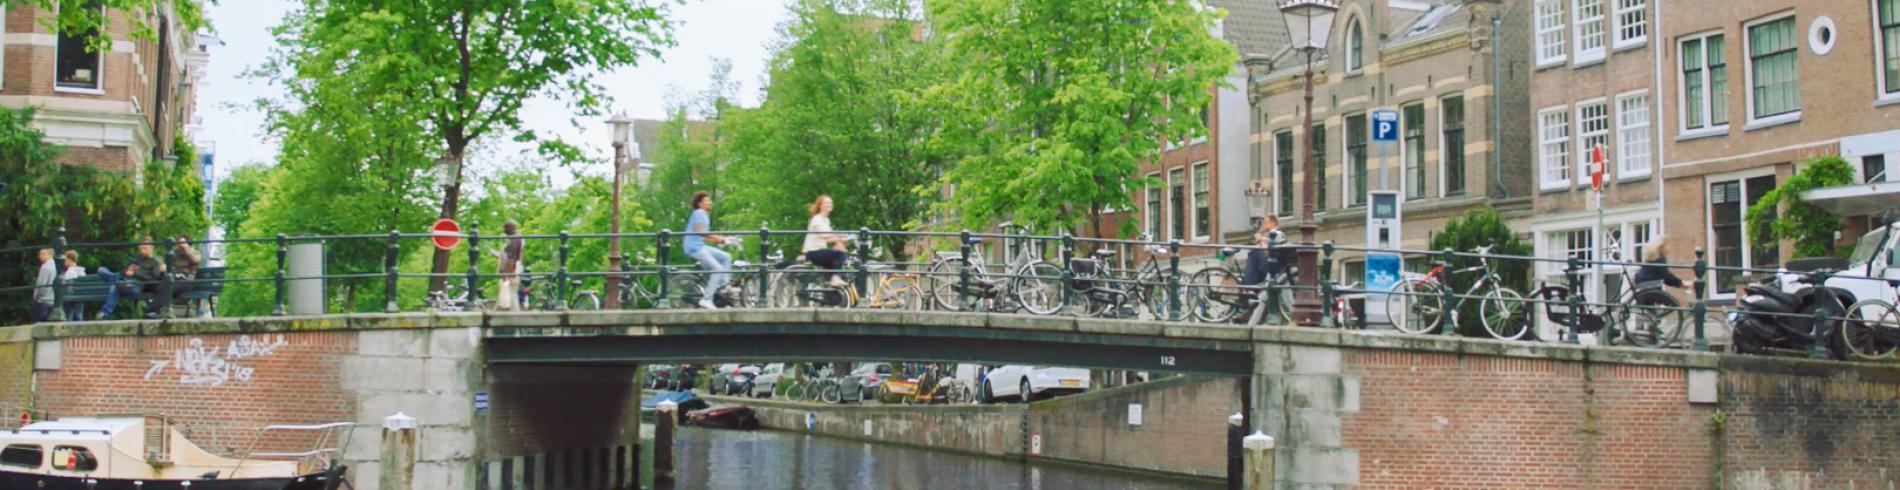 Couple riding bikes across a bridge in the sun